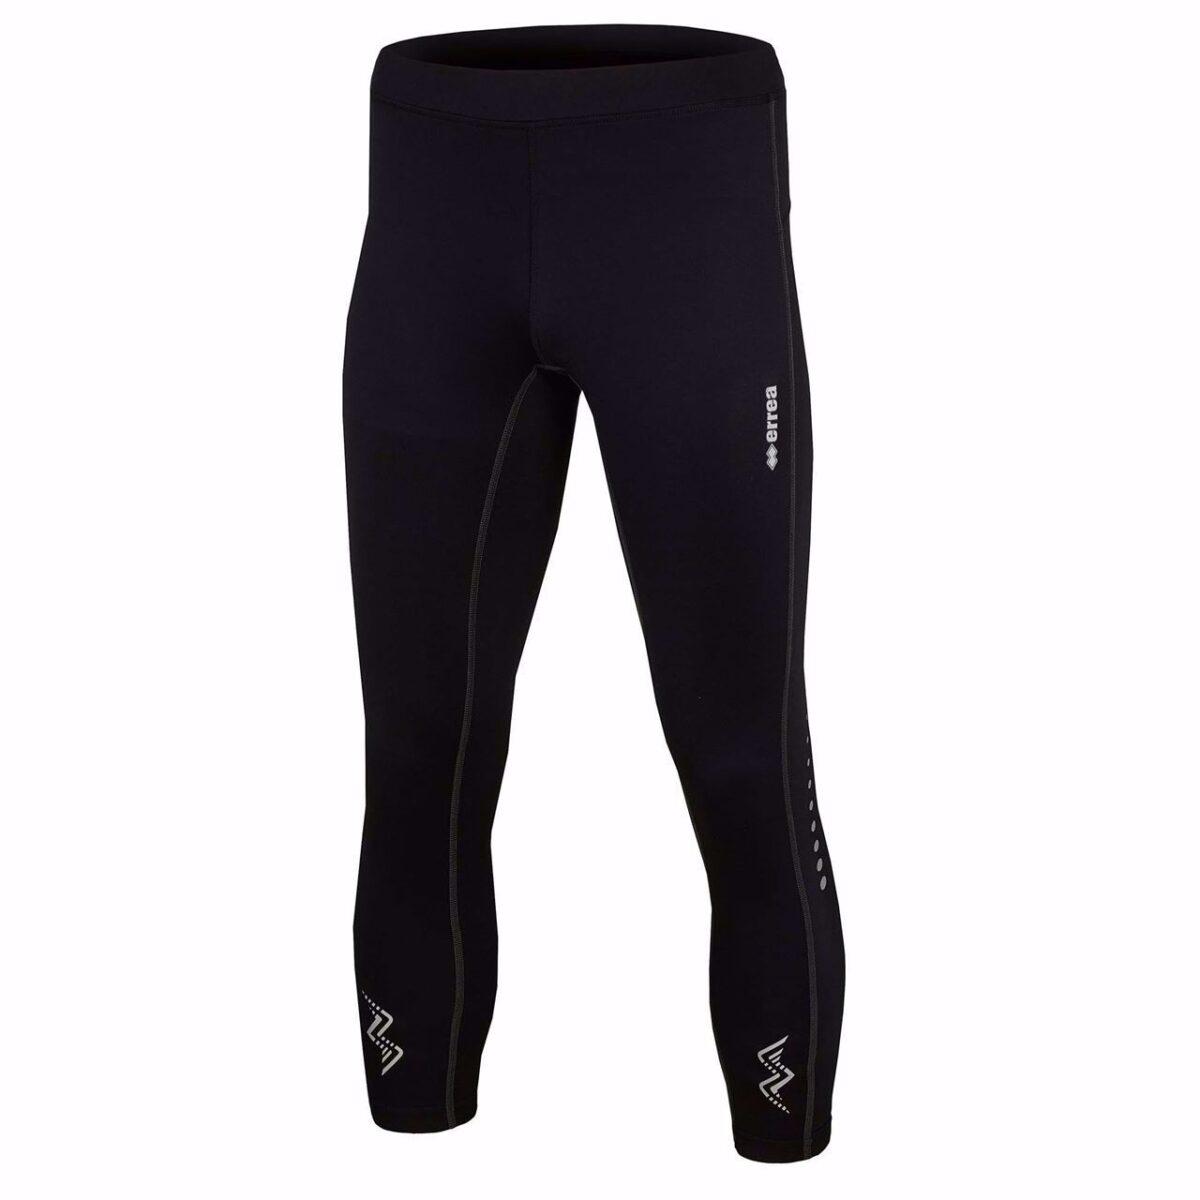 Errea Kios 3.0 Running Trousers FP871Z - Junior